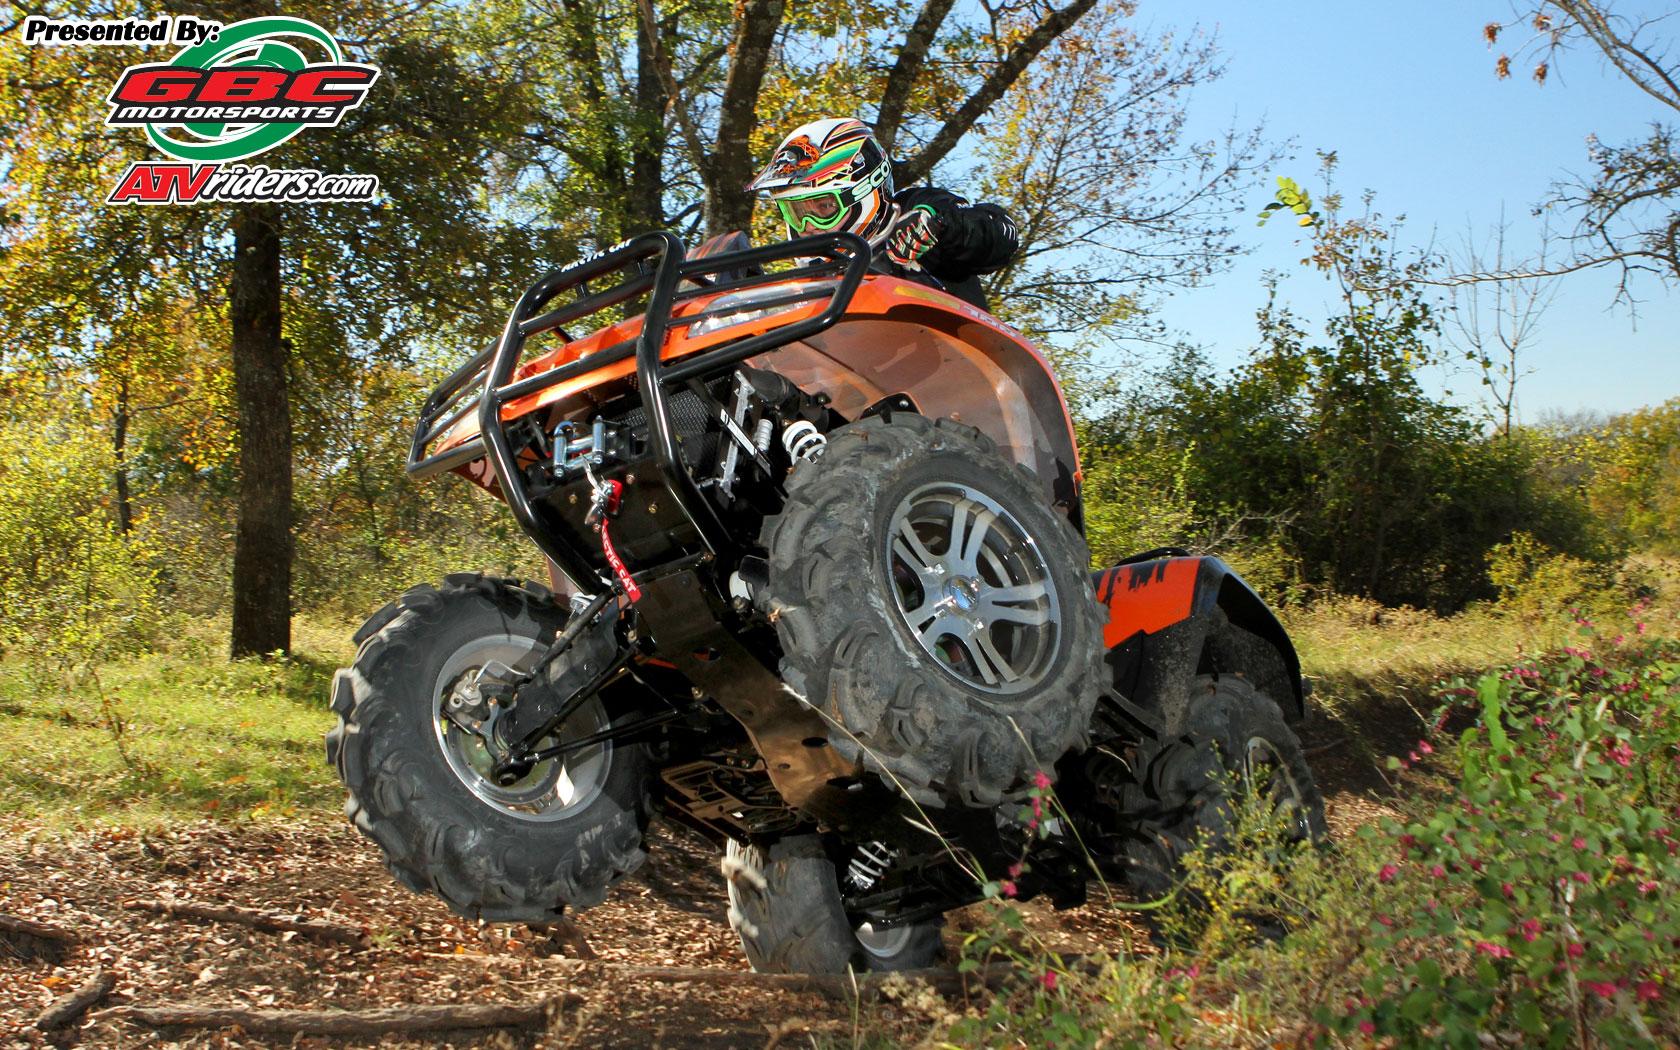 2011 Arctic Cat Mud Pro 700 4x4 Utility ATV Wheelie   Wednesday 1680x1050